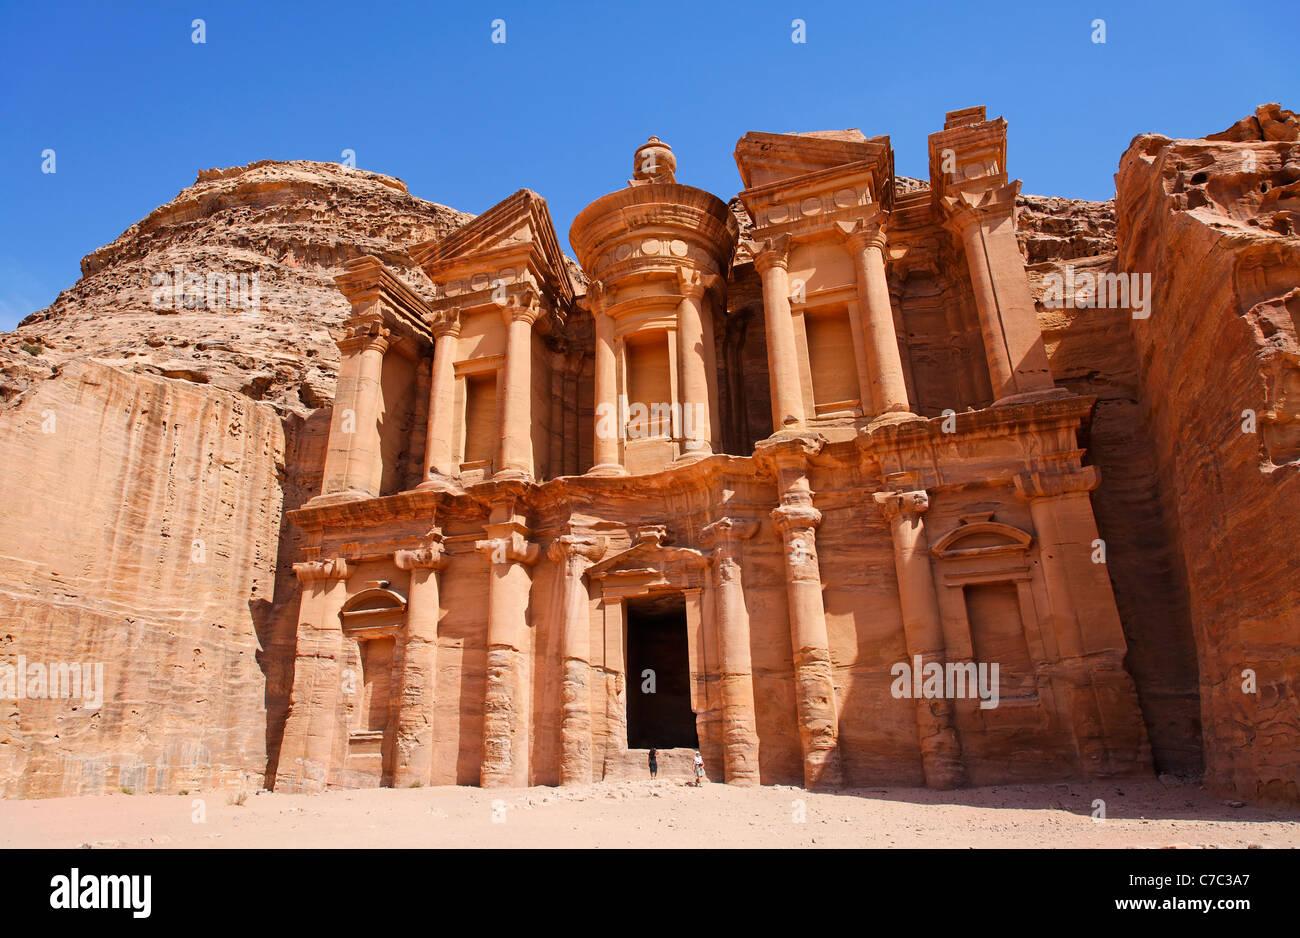 Das Kloster, geformt aus den Felsen in Petra, Jordanien Stockbild